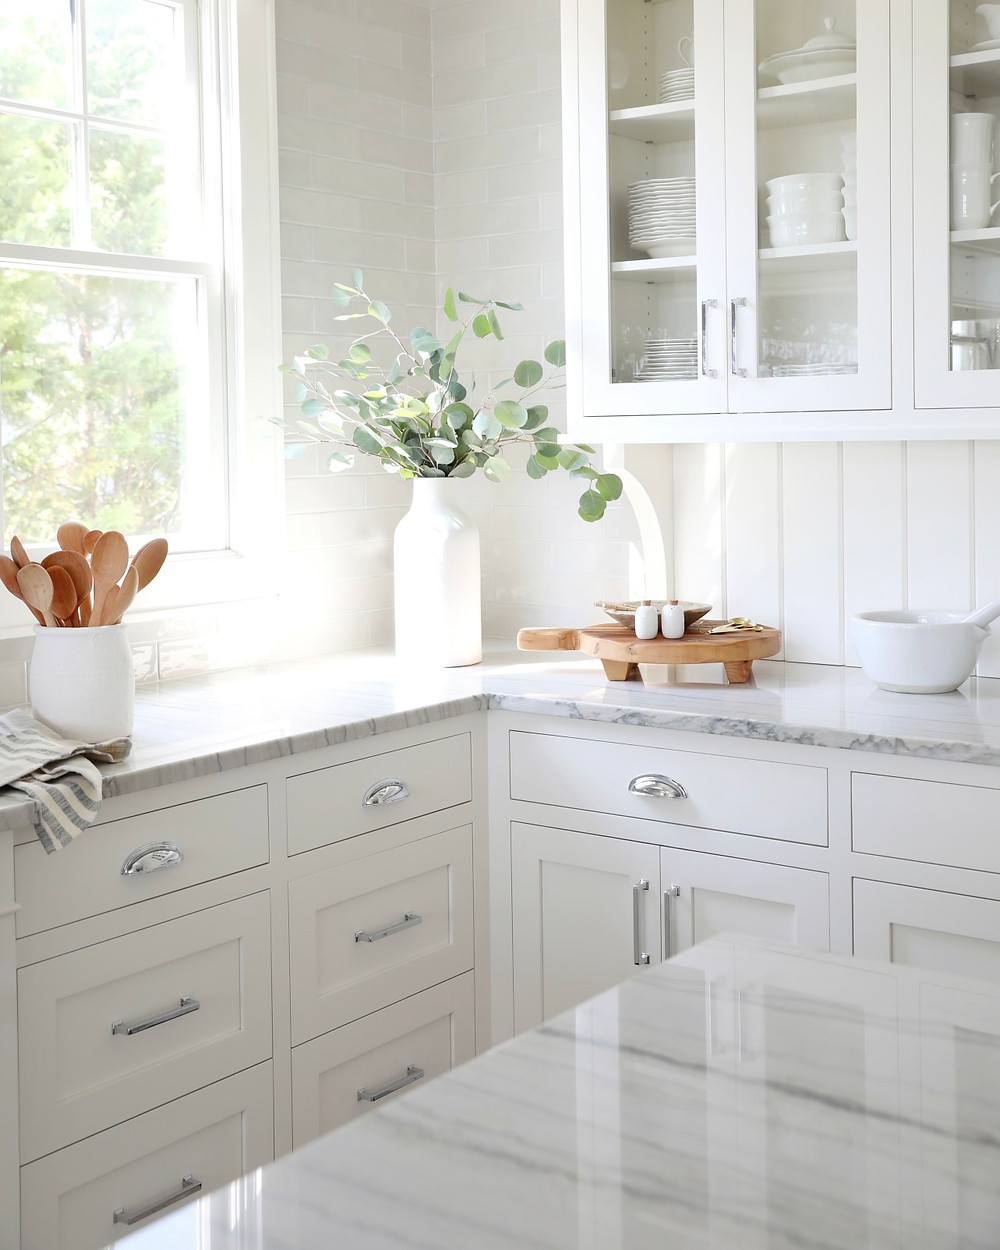 10 Healthy Kitchen Design Tips To Help You Nourish And Flourish